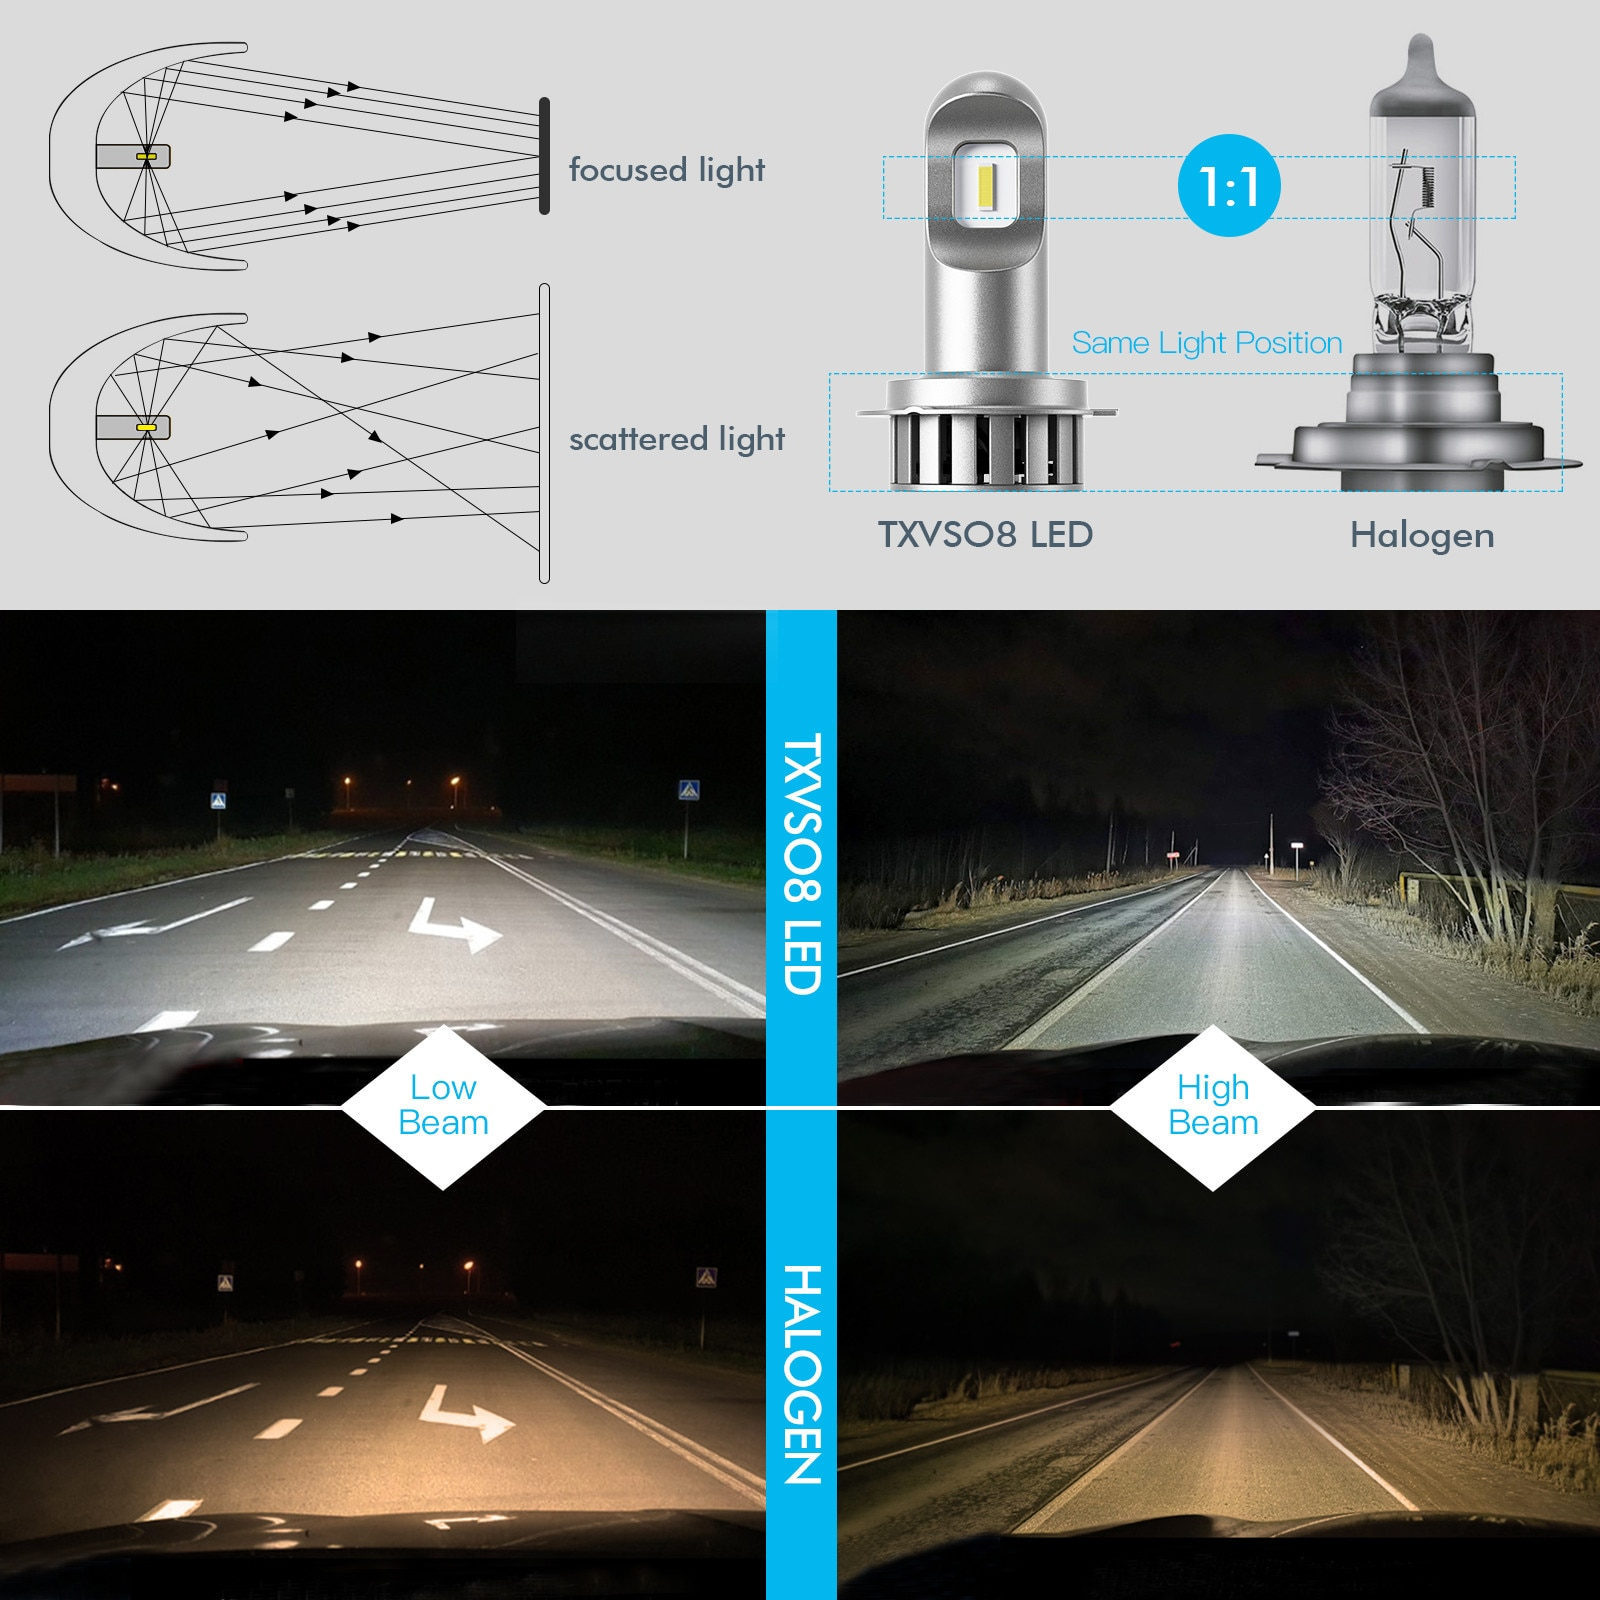 10000LM H7 Car Light Lamp Parking 50W Steering 6000K Super Bright Brakes Tail Bulbs